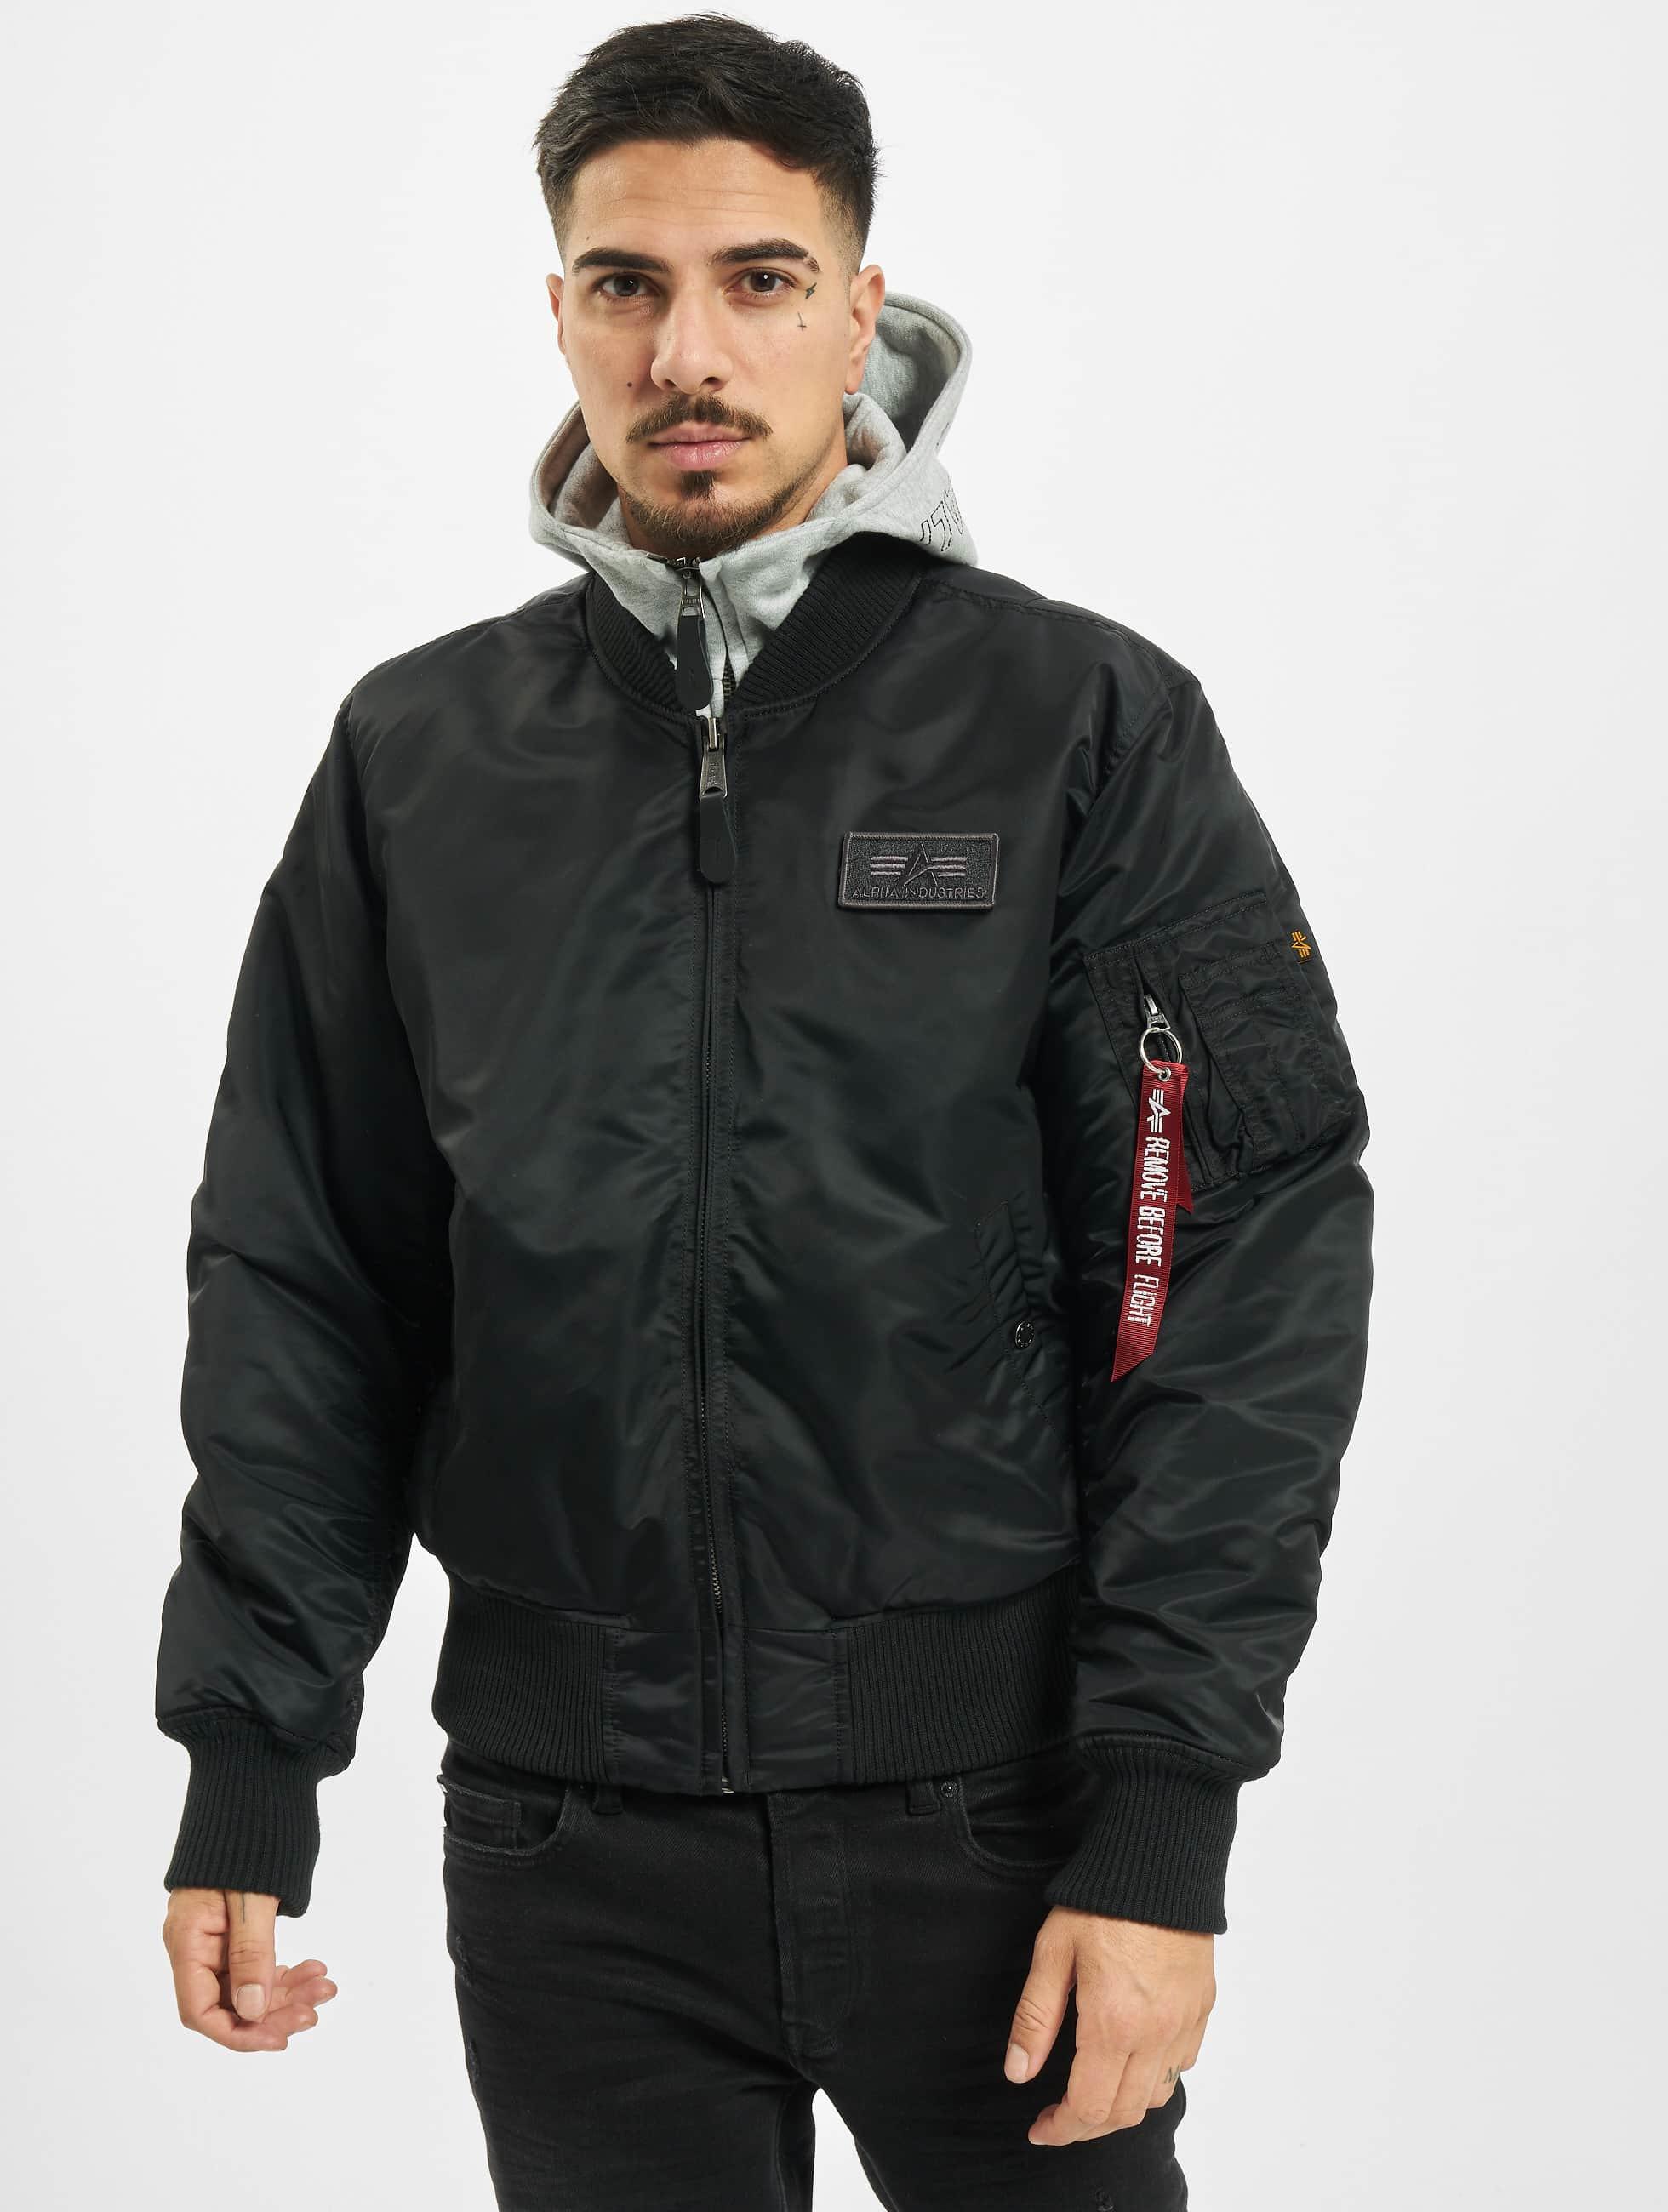 alpha industries herren winterjacke ma 1 d tec bomber jacket ebay. Black Bedroom Furniture Sets. Home Design Ideas